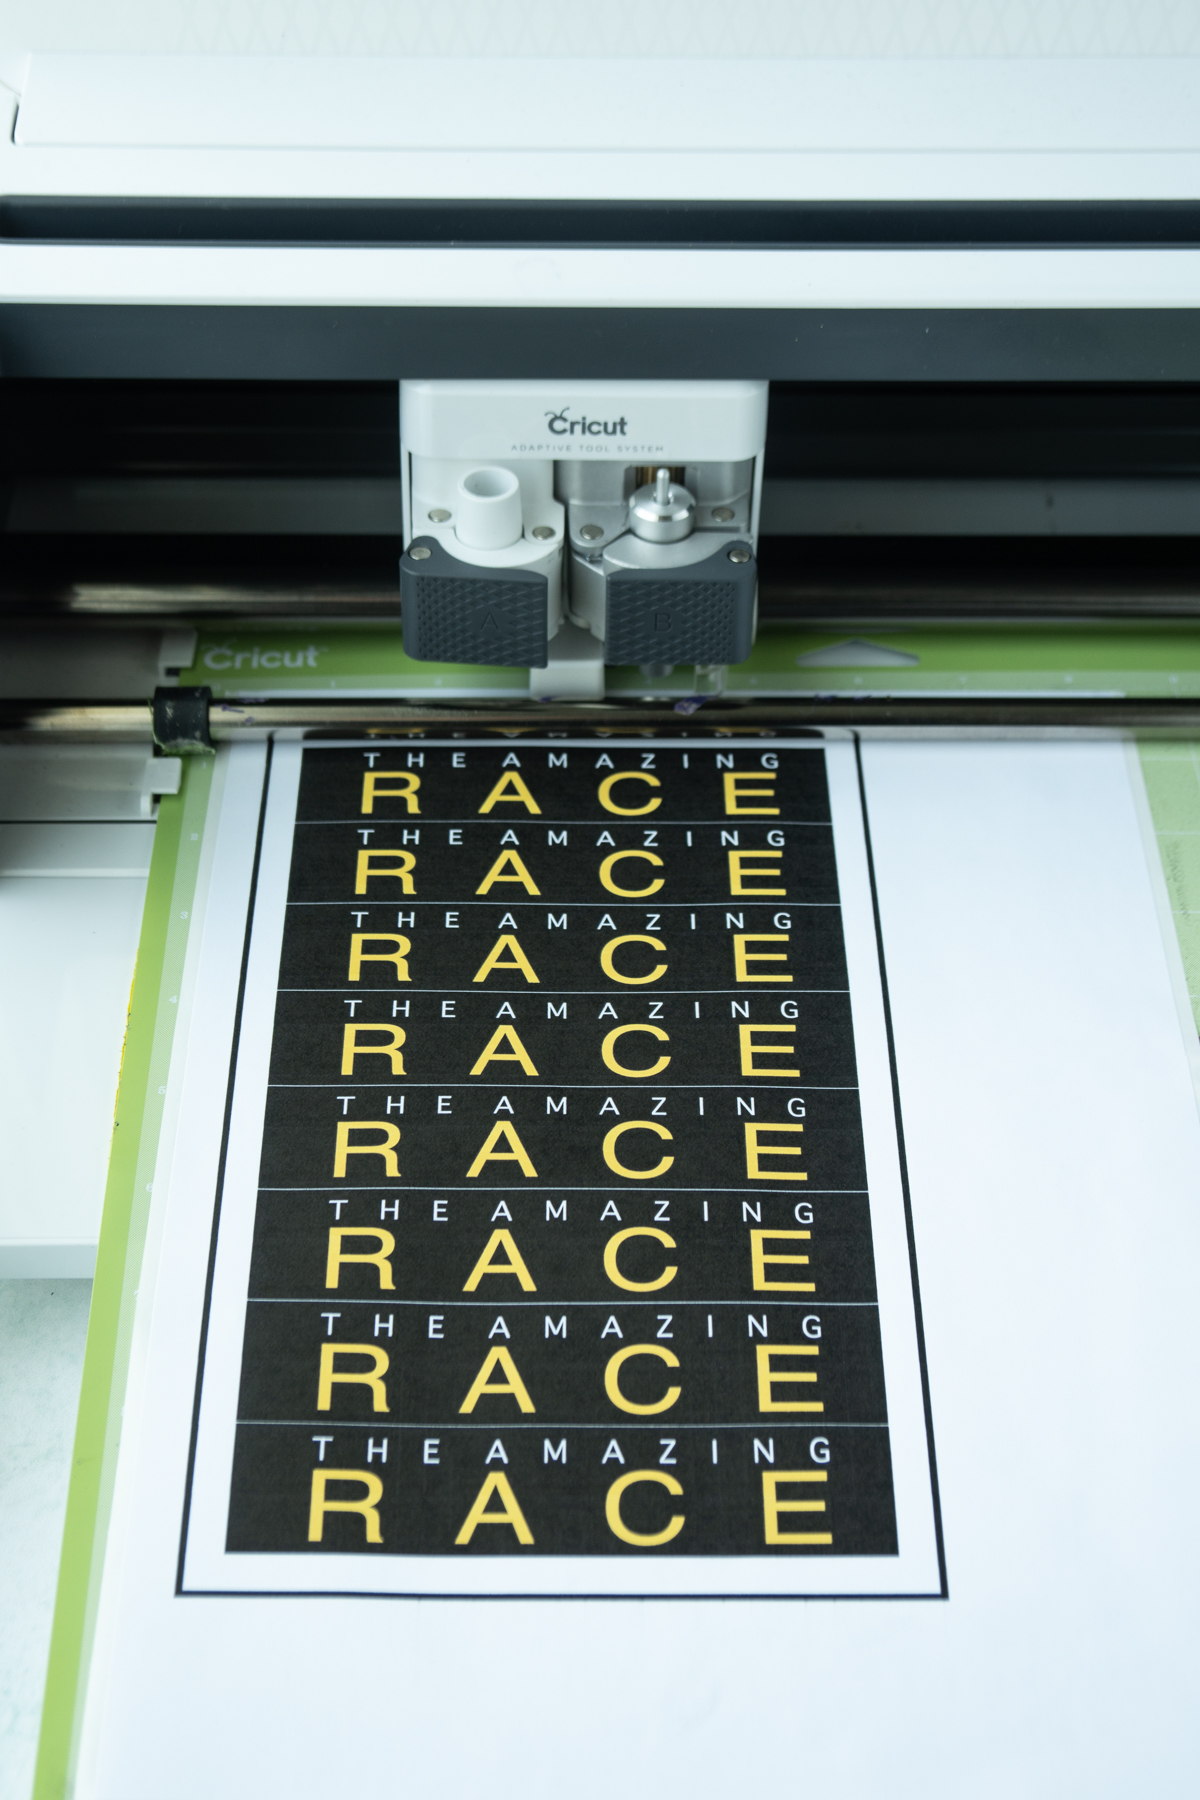 Amazing Race envelope stickers loaded onto a Cricut Maker